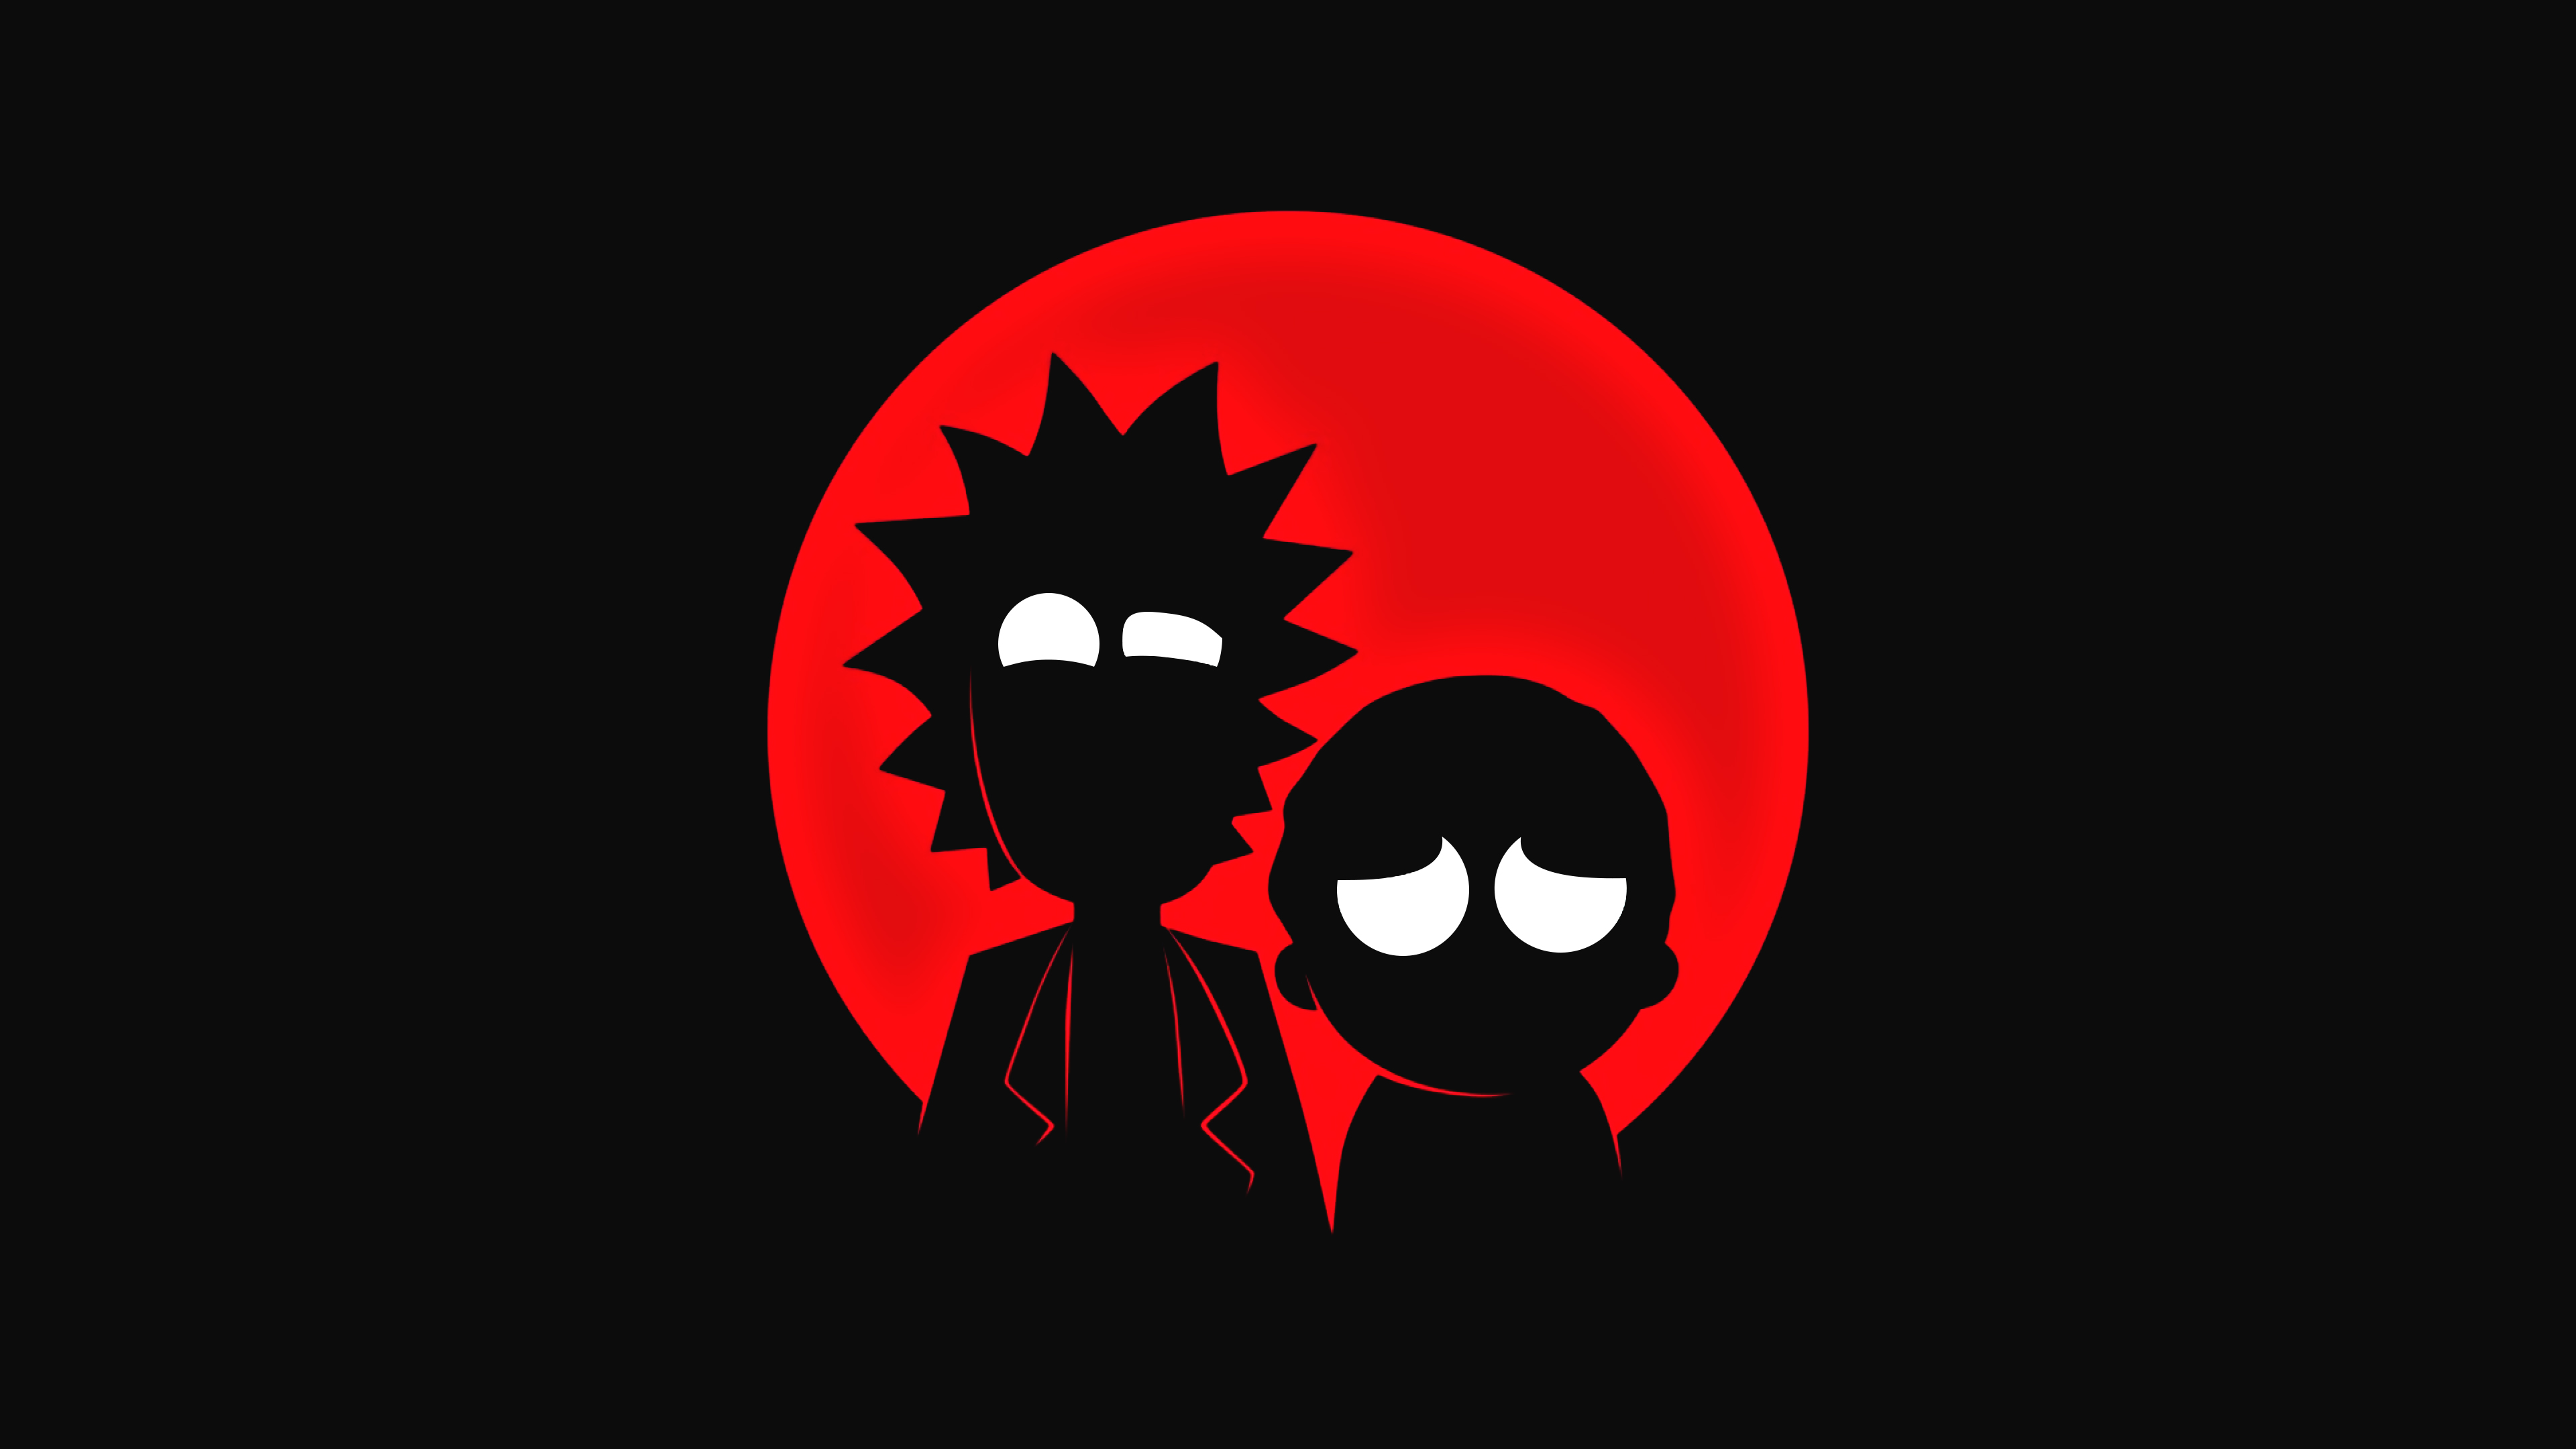 Fondos de pantalla Rick and Morty Minimalista